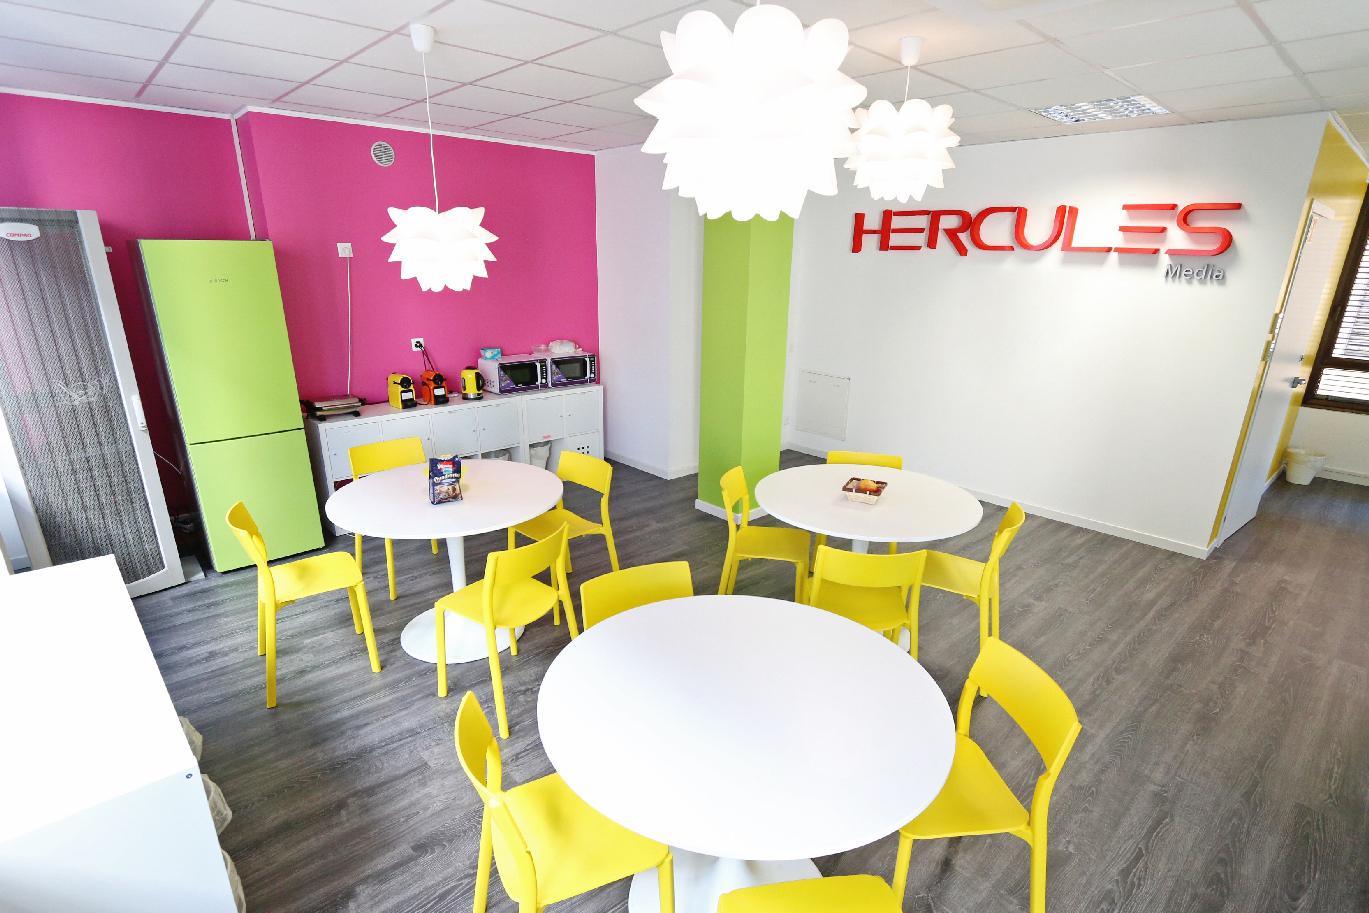 ufficio-hercules-(17)